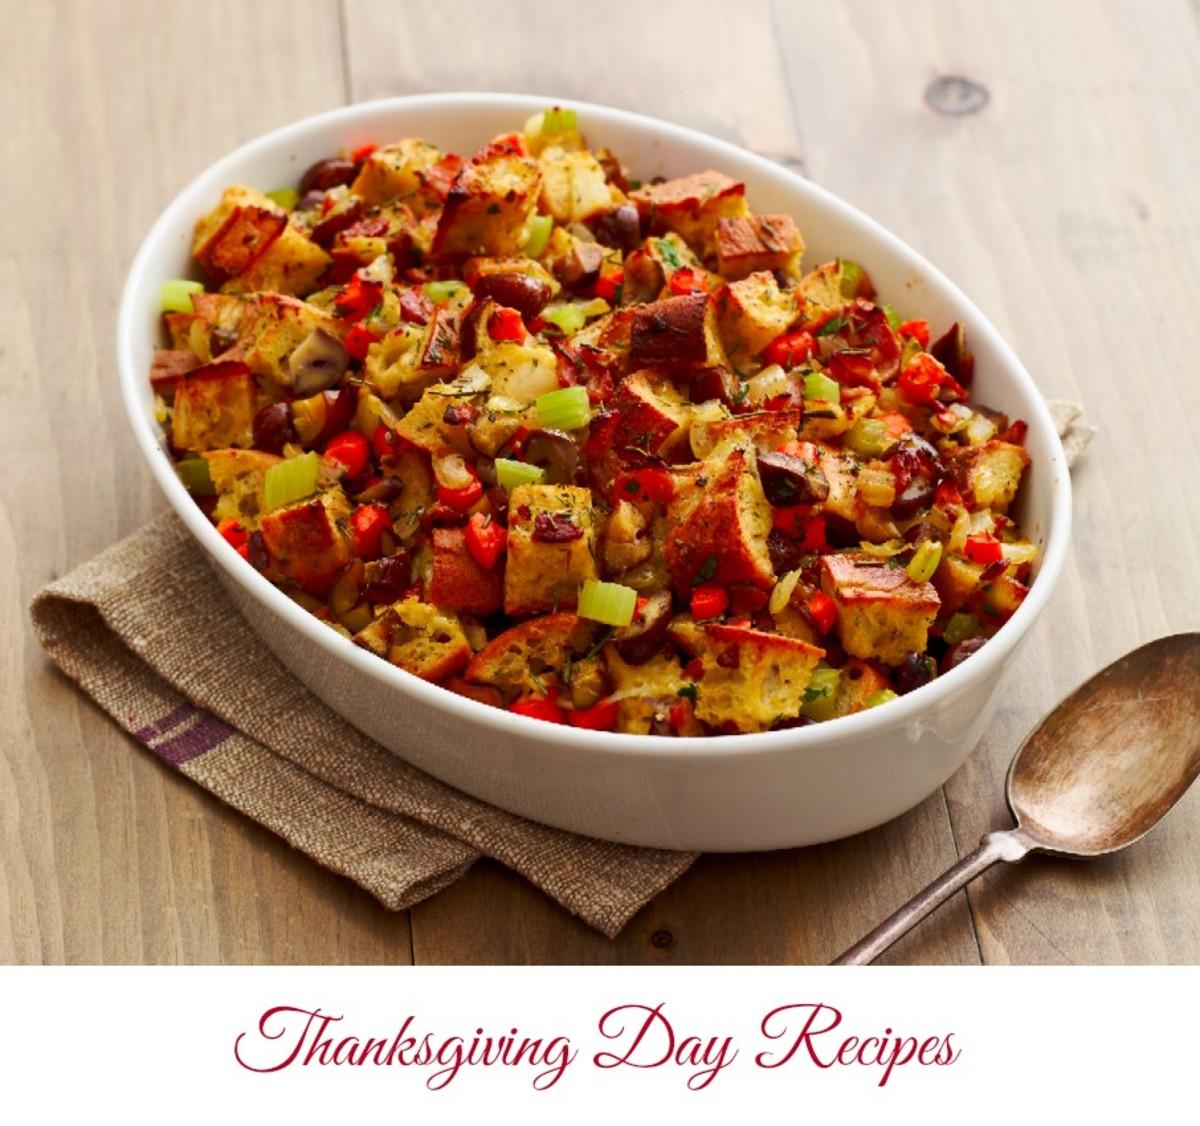 Recipes From Giada Feel Good Food